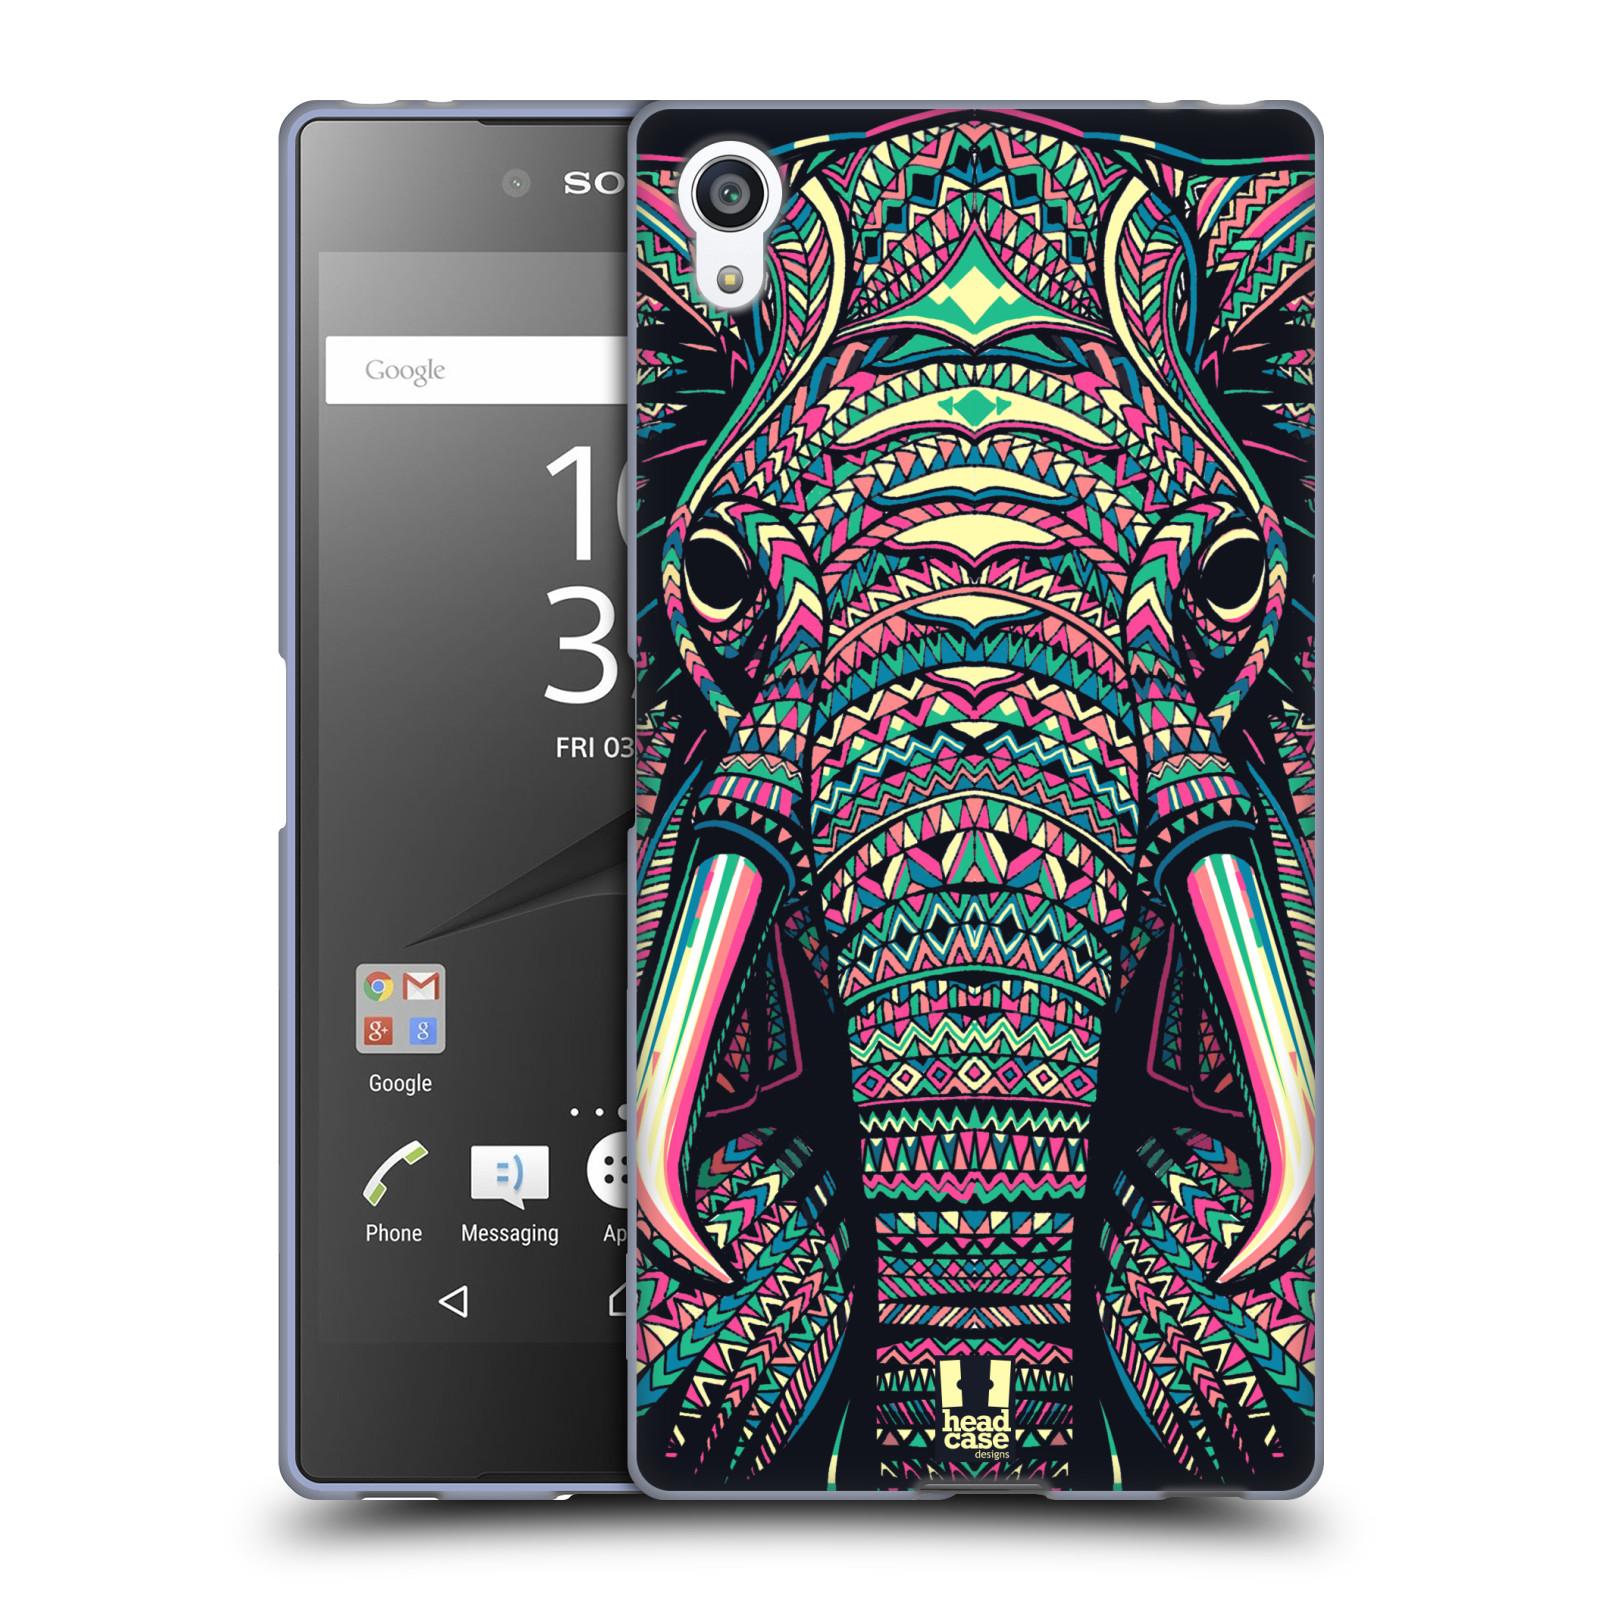 Silikonové pouzdro na mobil Sony Xperia Z5 Premium HEAD CASE AZTEC SLON